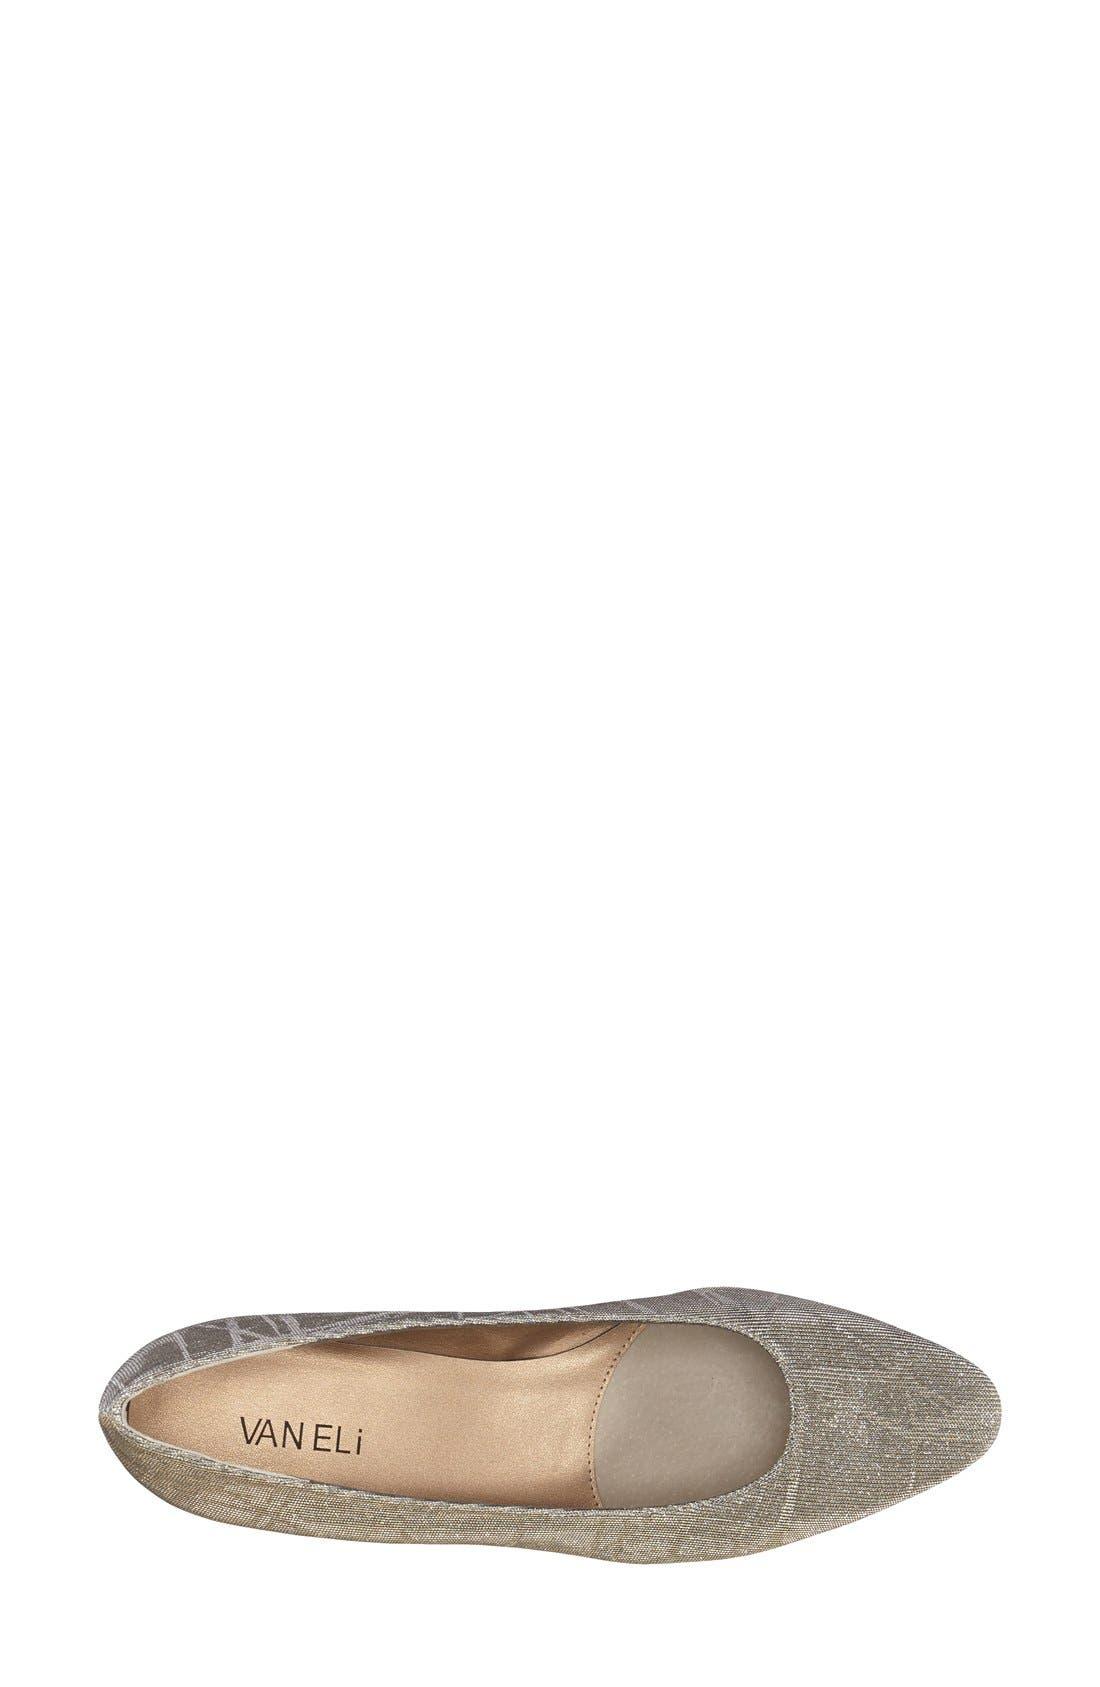 Alternate Image 3  - VANELi 'Astyr' Almond Toe Pump (Women)